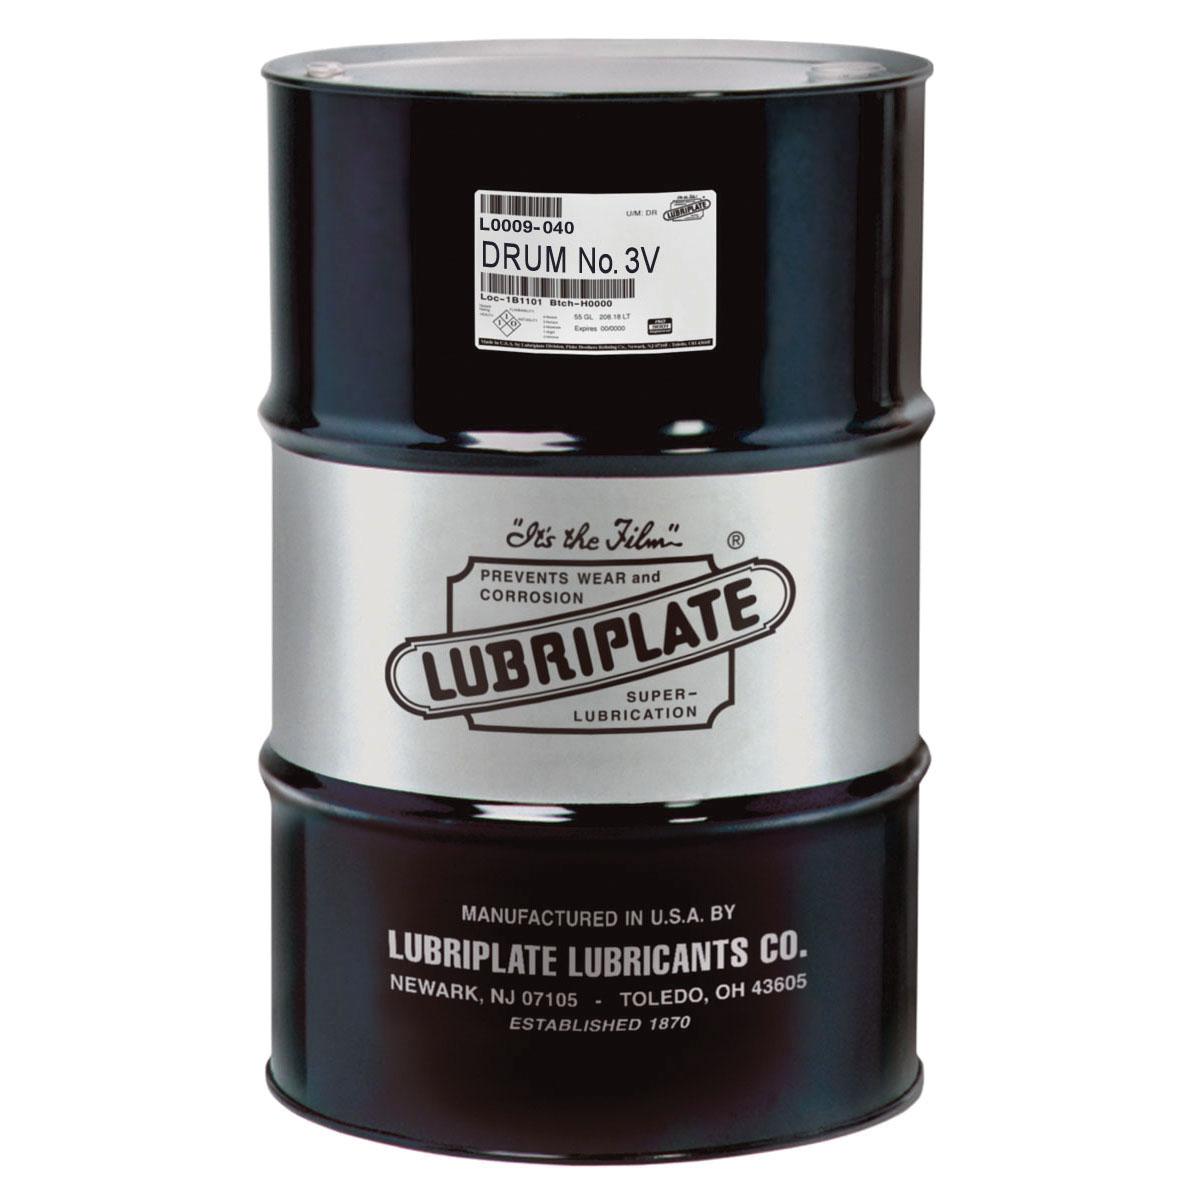 Lubriplate® L0009-040 3-V Petroleum Based Machine Oil, 415 lb Drum, Mineral Oil Odor/Scent, Liquid Form, Amber